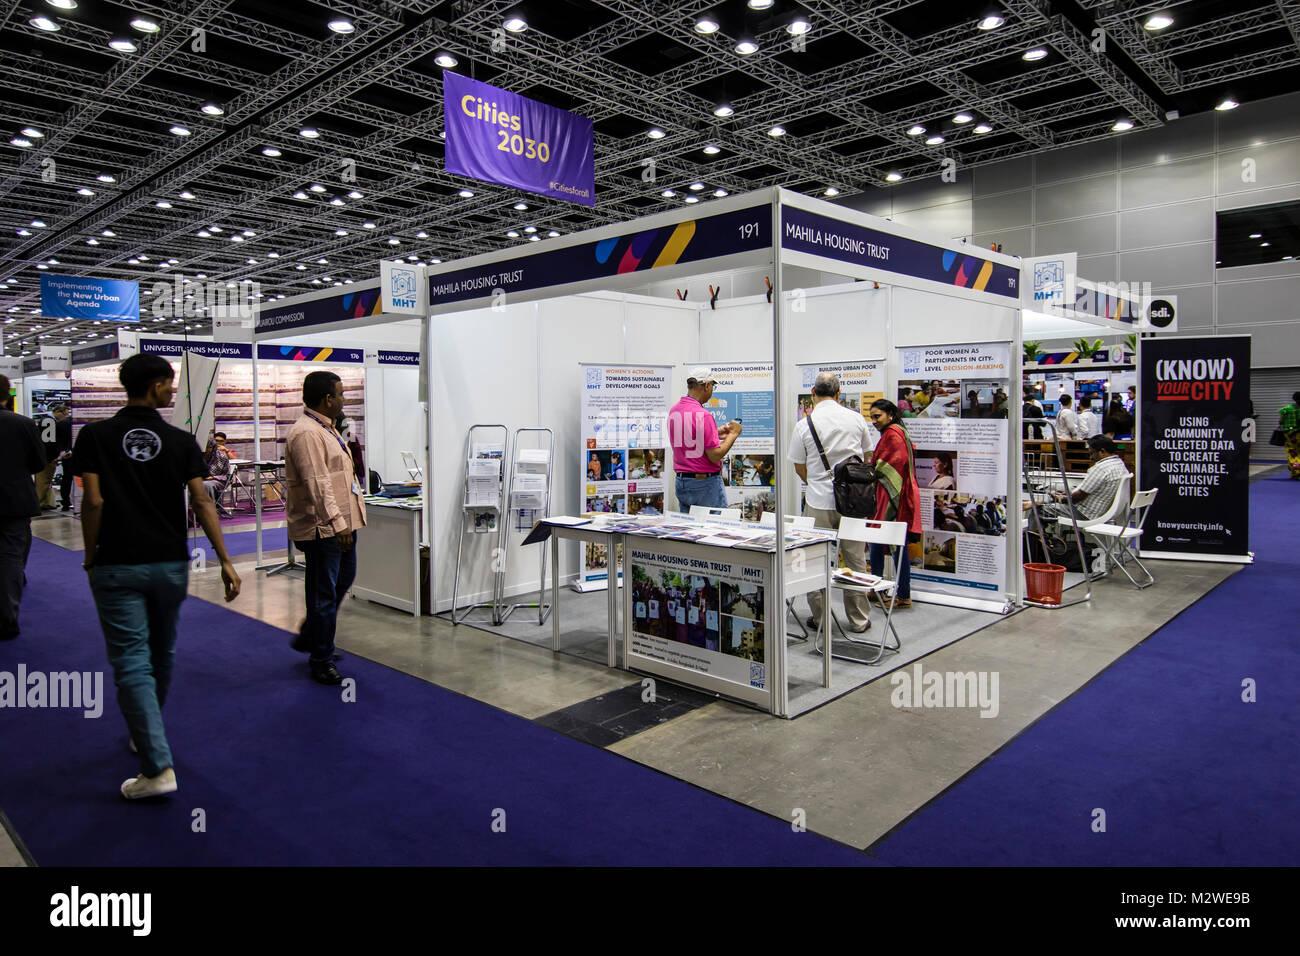 Exhibition Booth Rental Kuala Lumpur : Kuala lumpur malaysia th february exhibitors